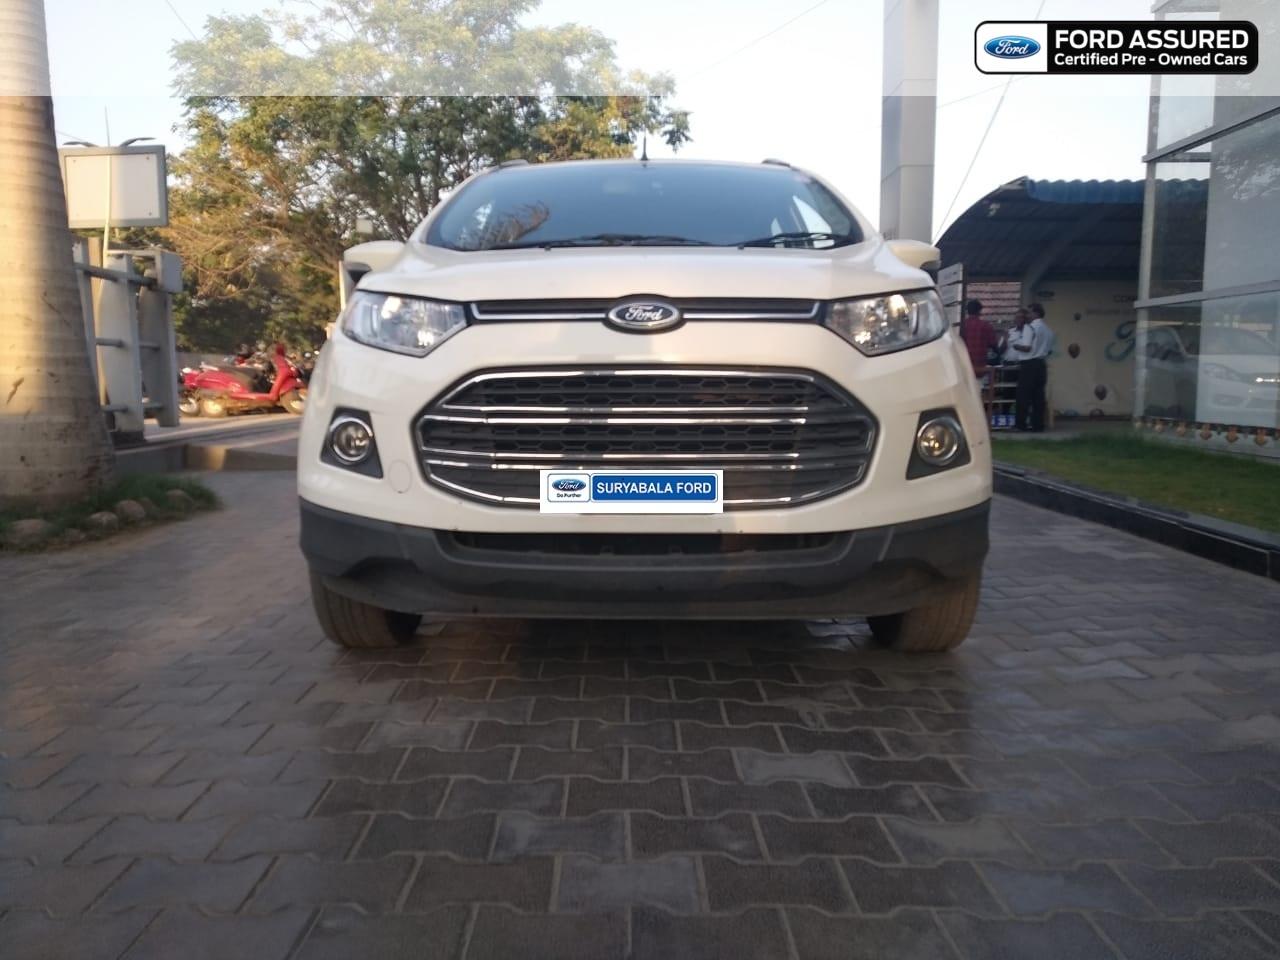 Ford Ecosport 2015-2021 1.5 Petrol Titanium BSIV